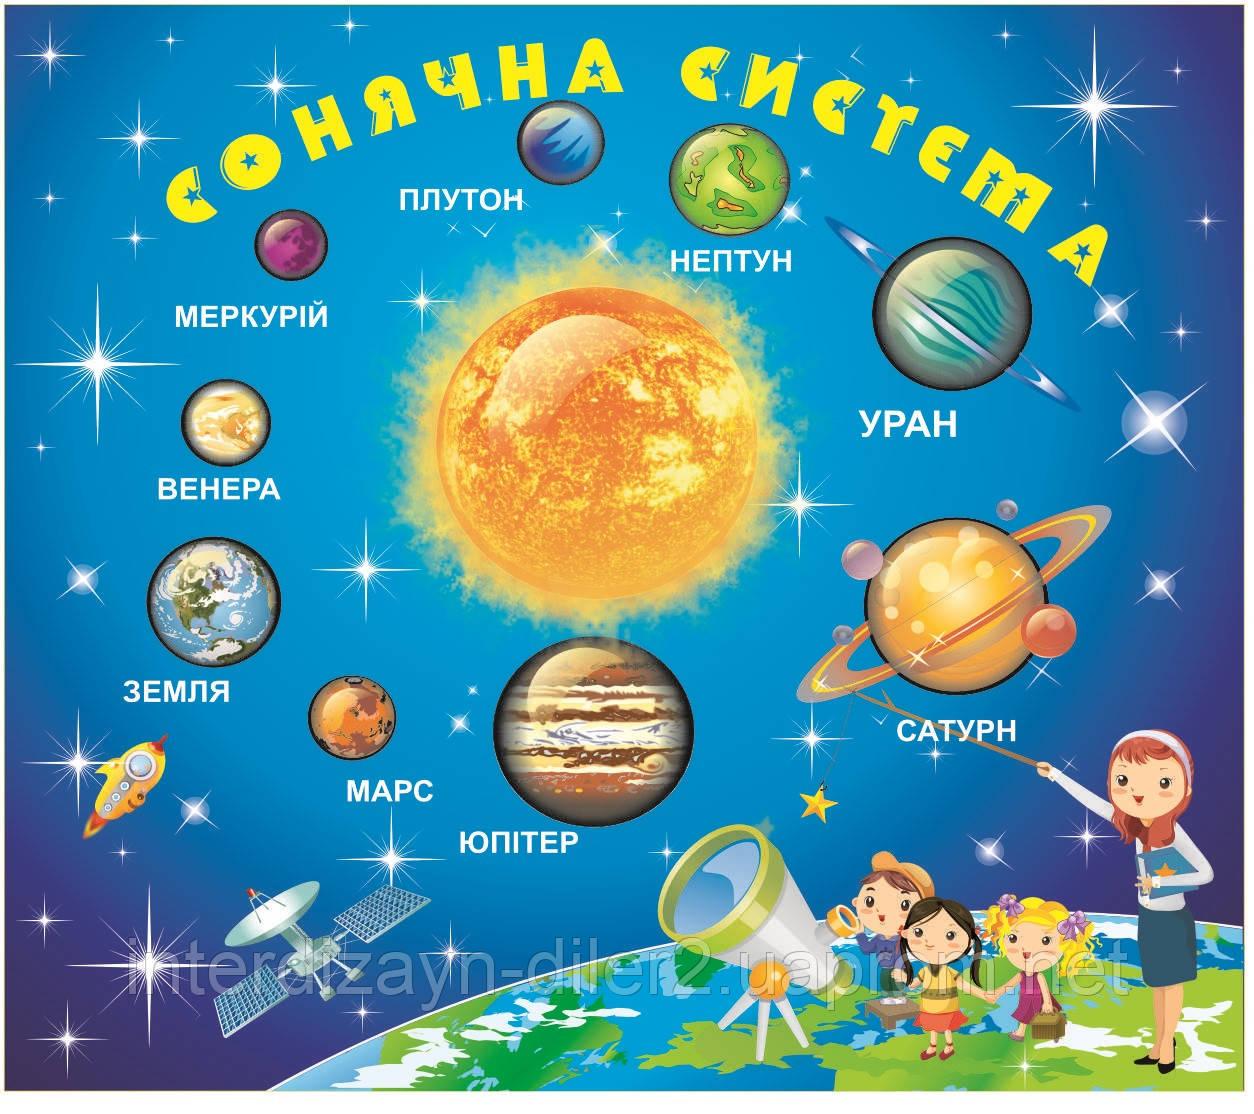 Стенд Сонячна система